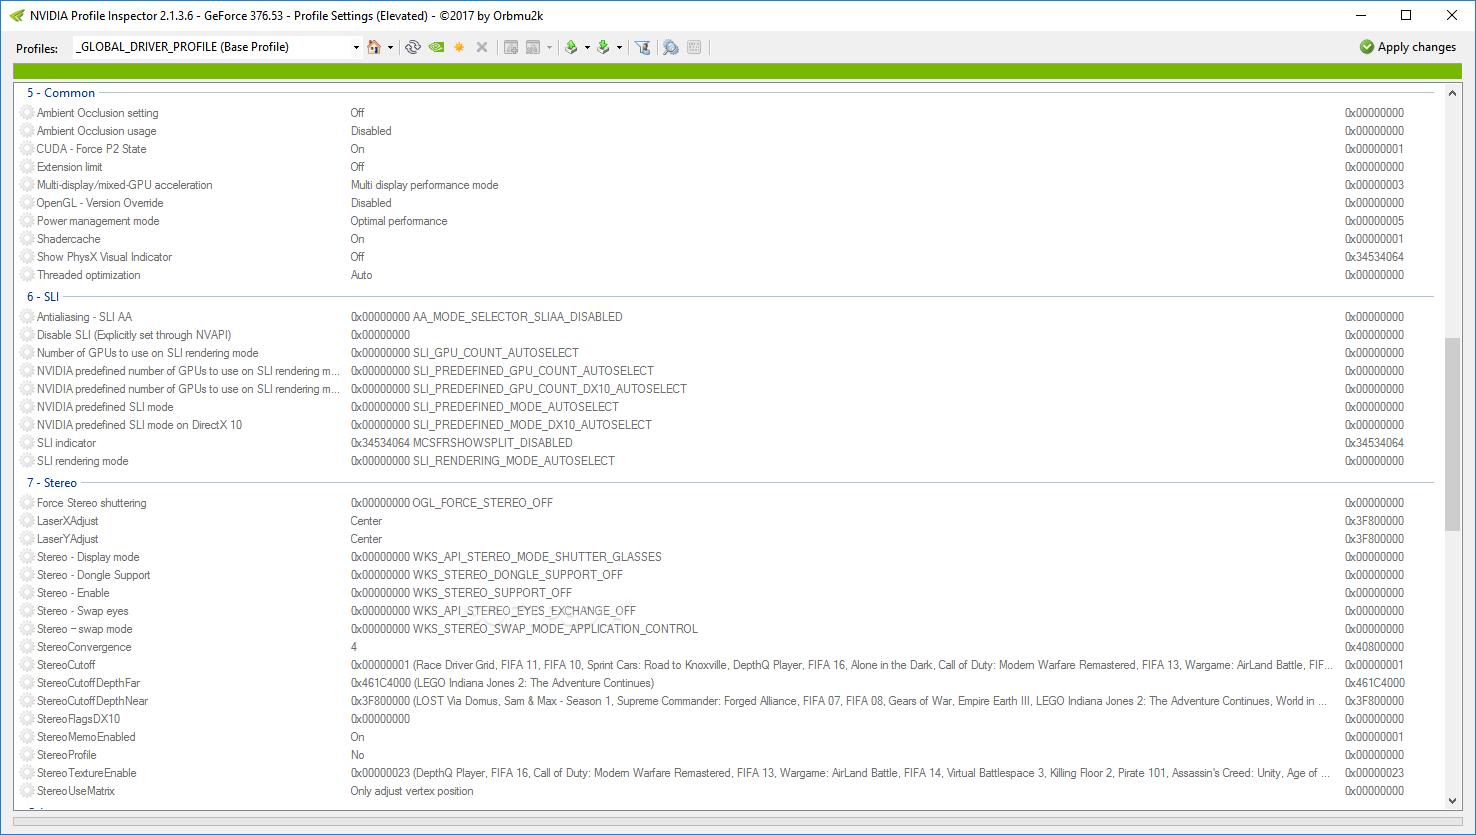 GeForce Overclocking & Tuning Utilities: NVIDIA Profile Inspector